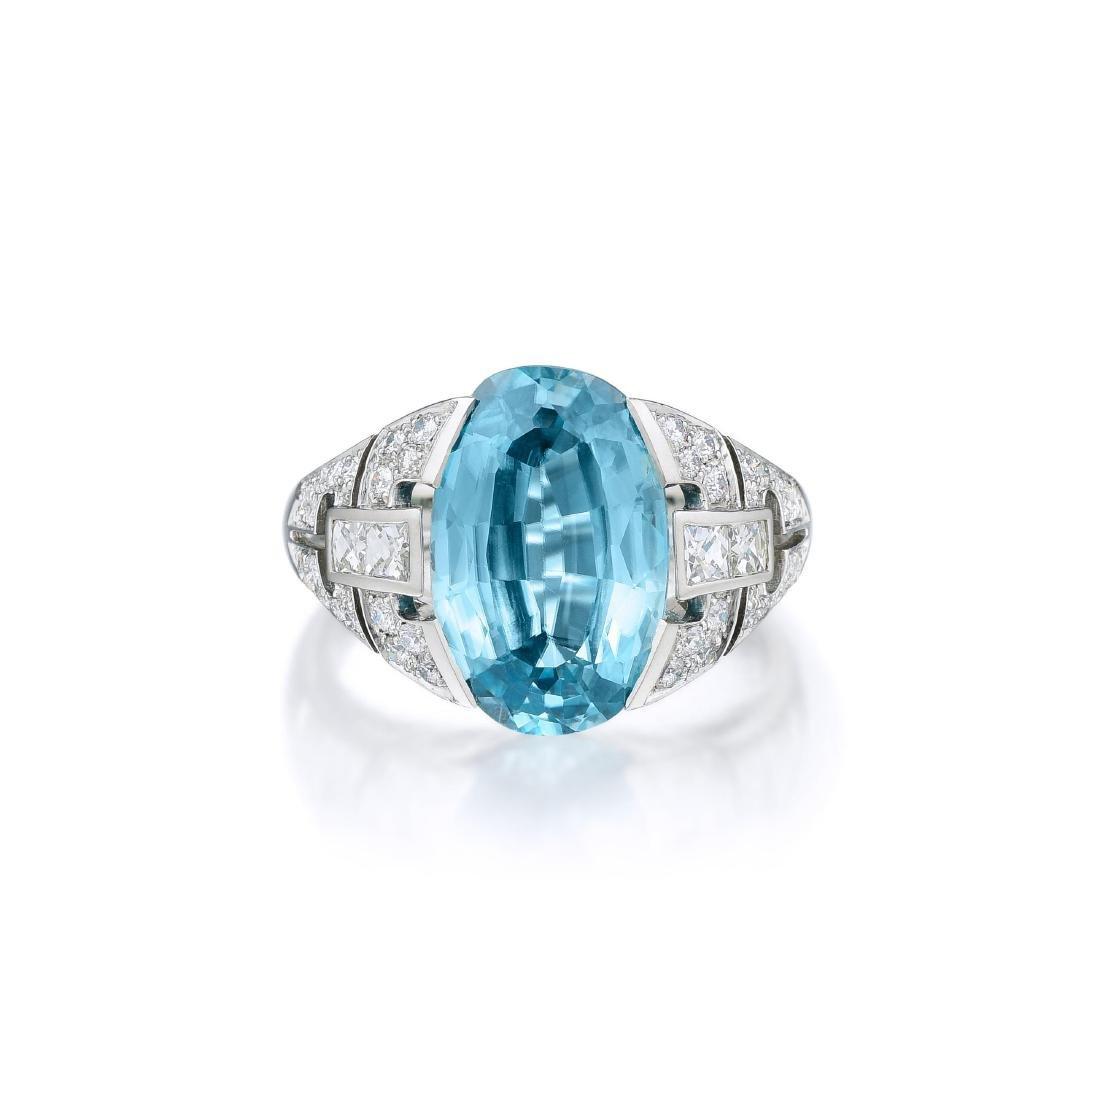 A Platinum Zircon and Diamond Ring